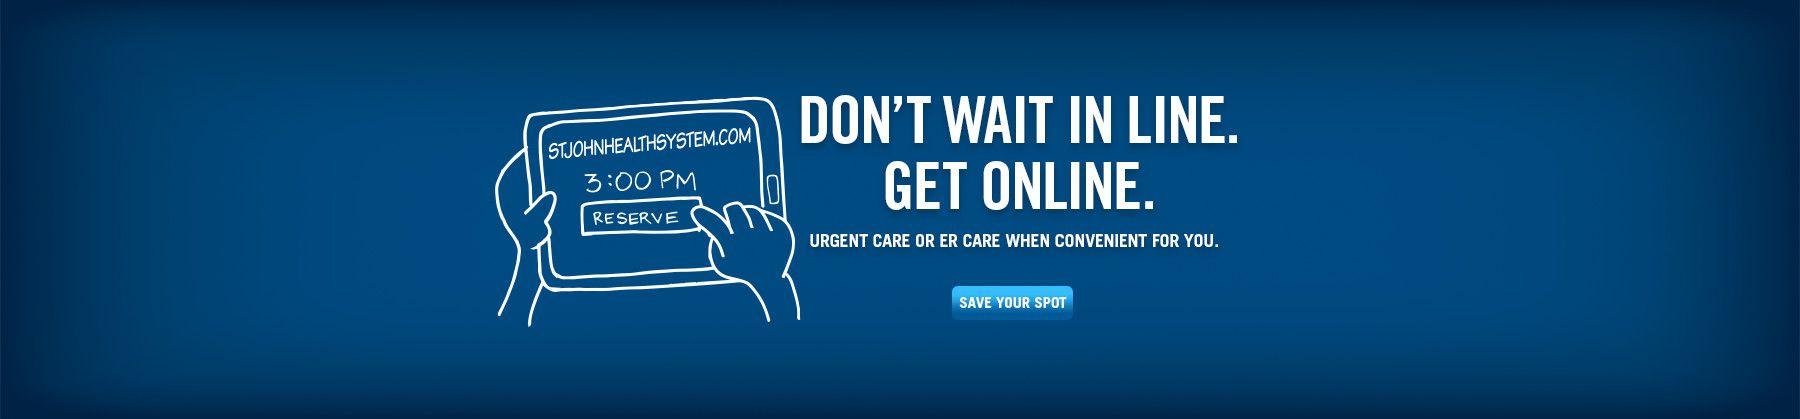 Don't Wait In Line. Get Online.